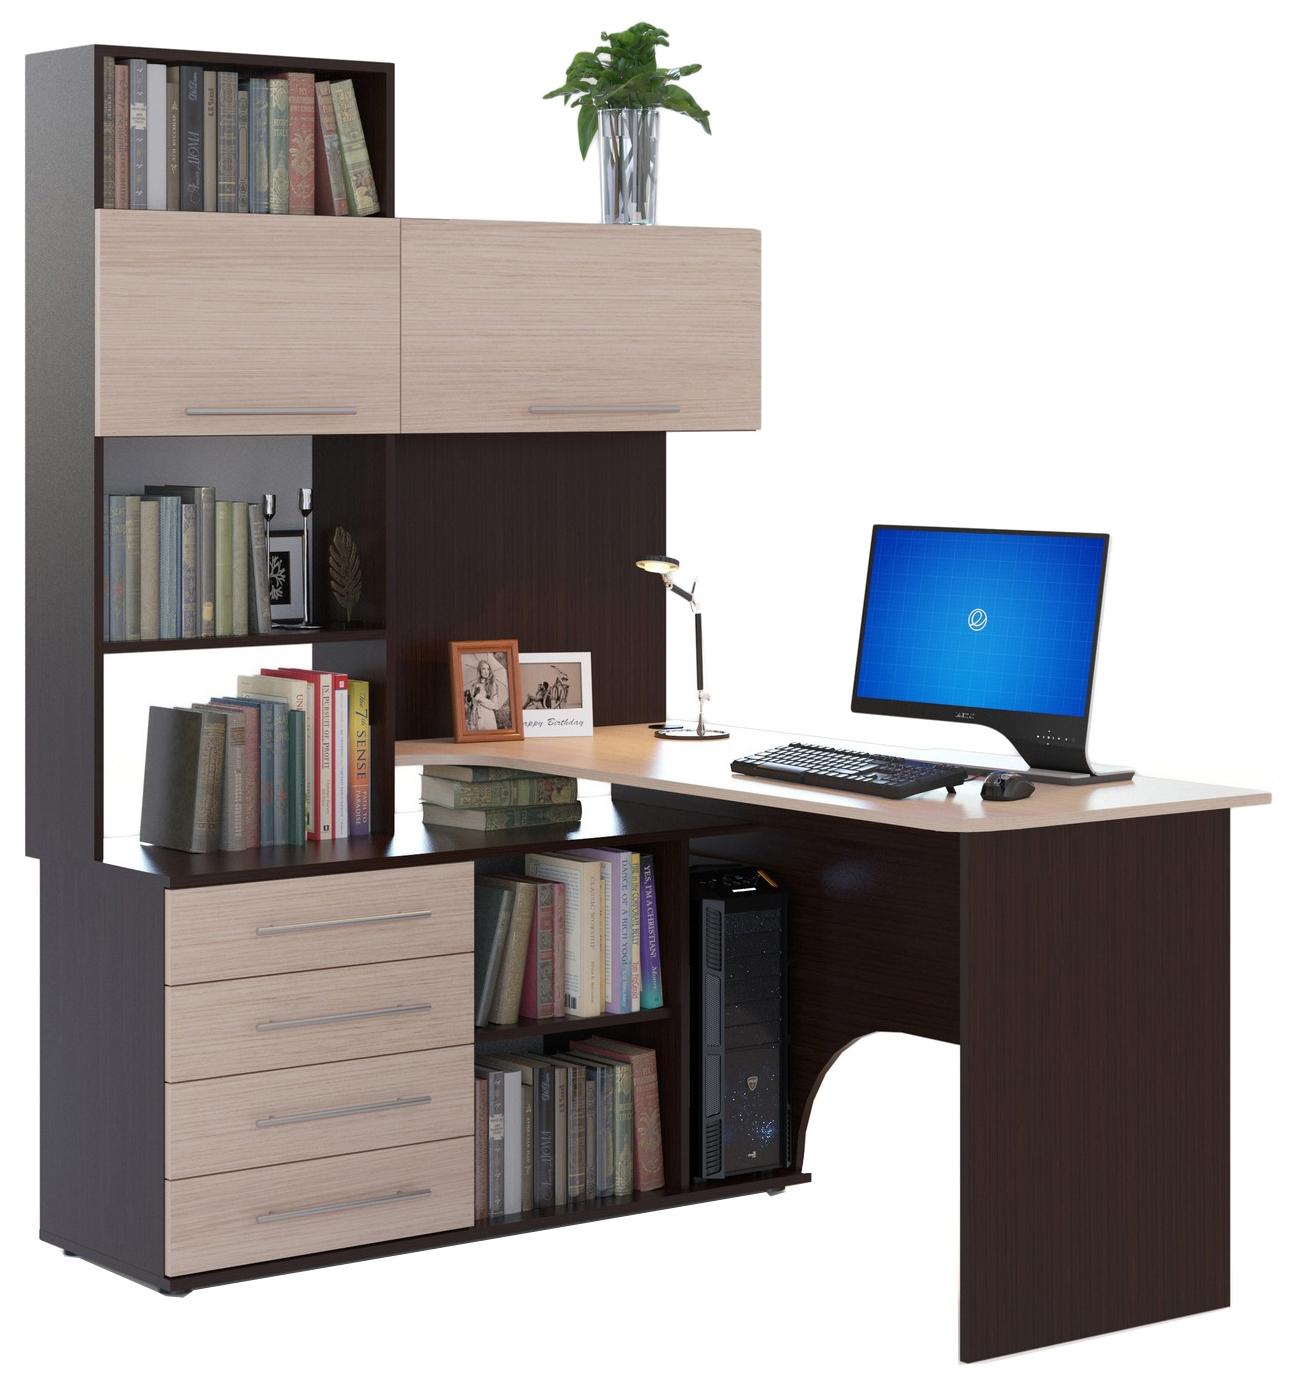 Компьютерный стол СОКОЛ КСТ-14П 140x123,5x182,8, венге/беленый дуб